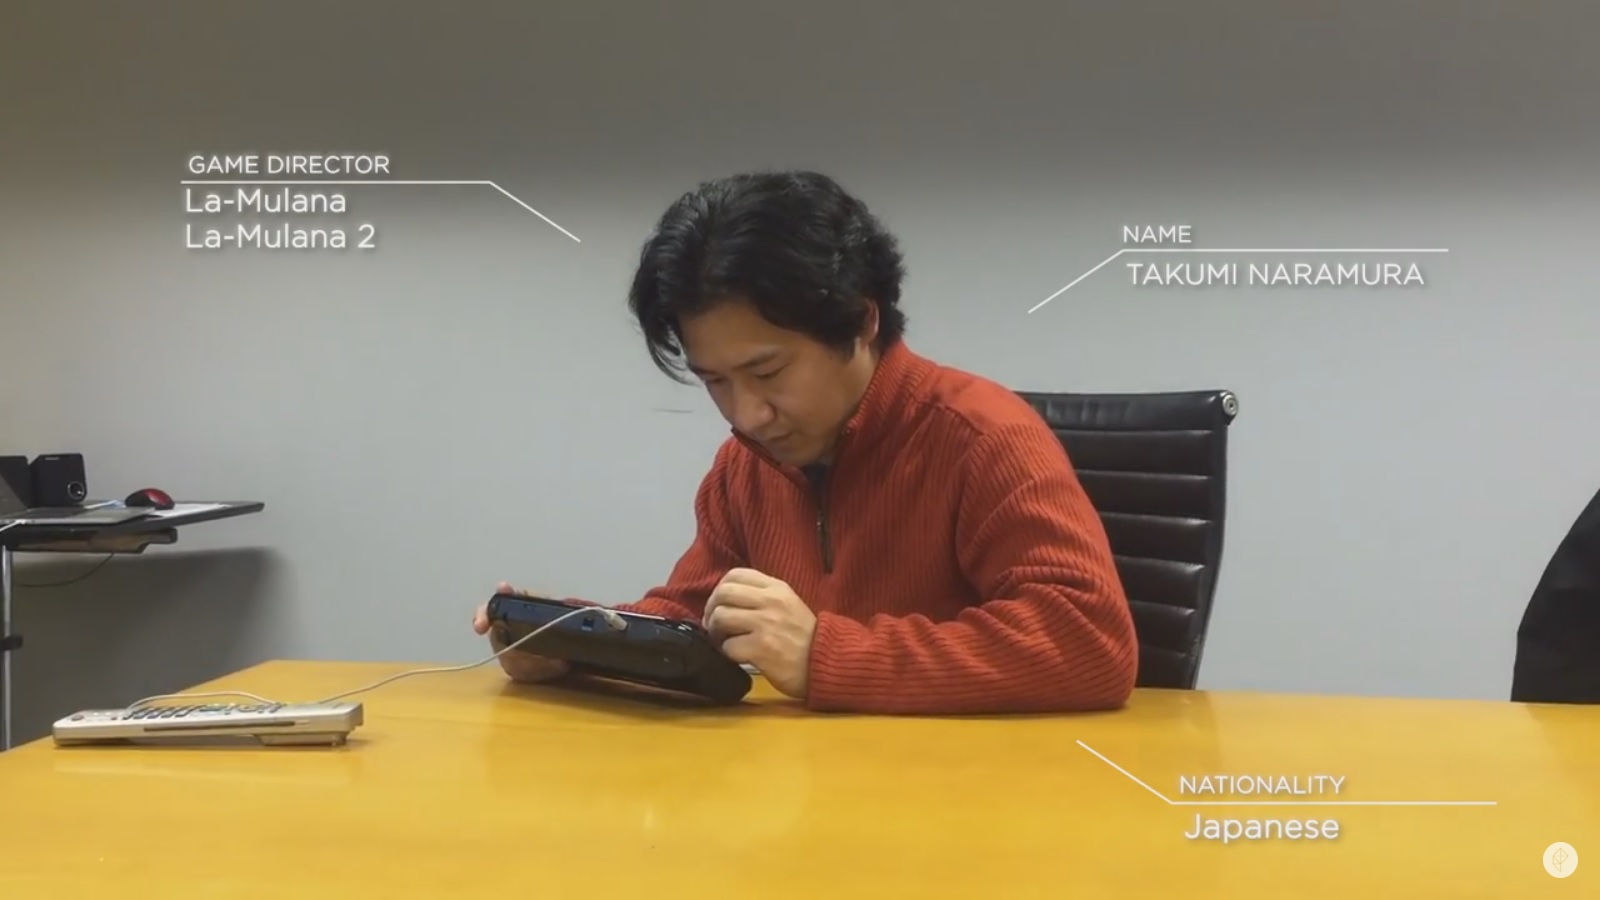 La-Mulana director Takumi Naramura makes a Super Mario Maker